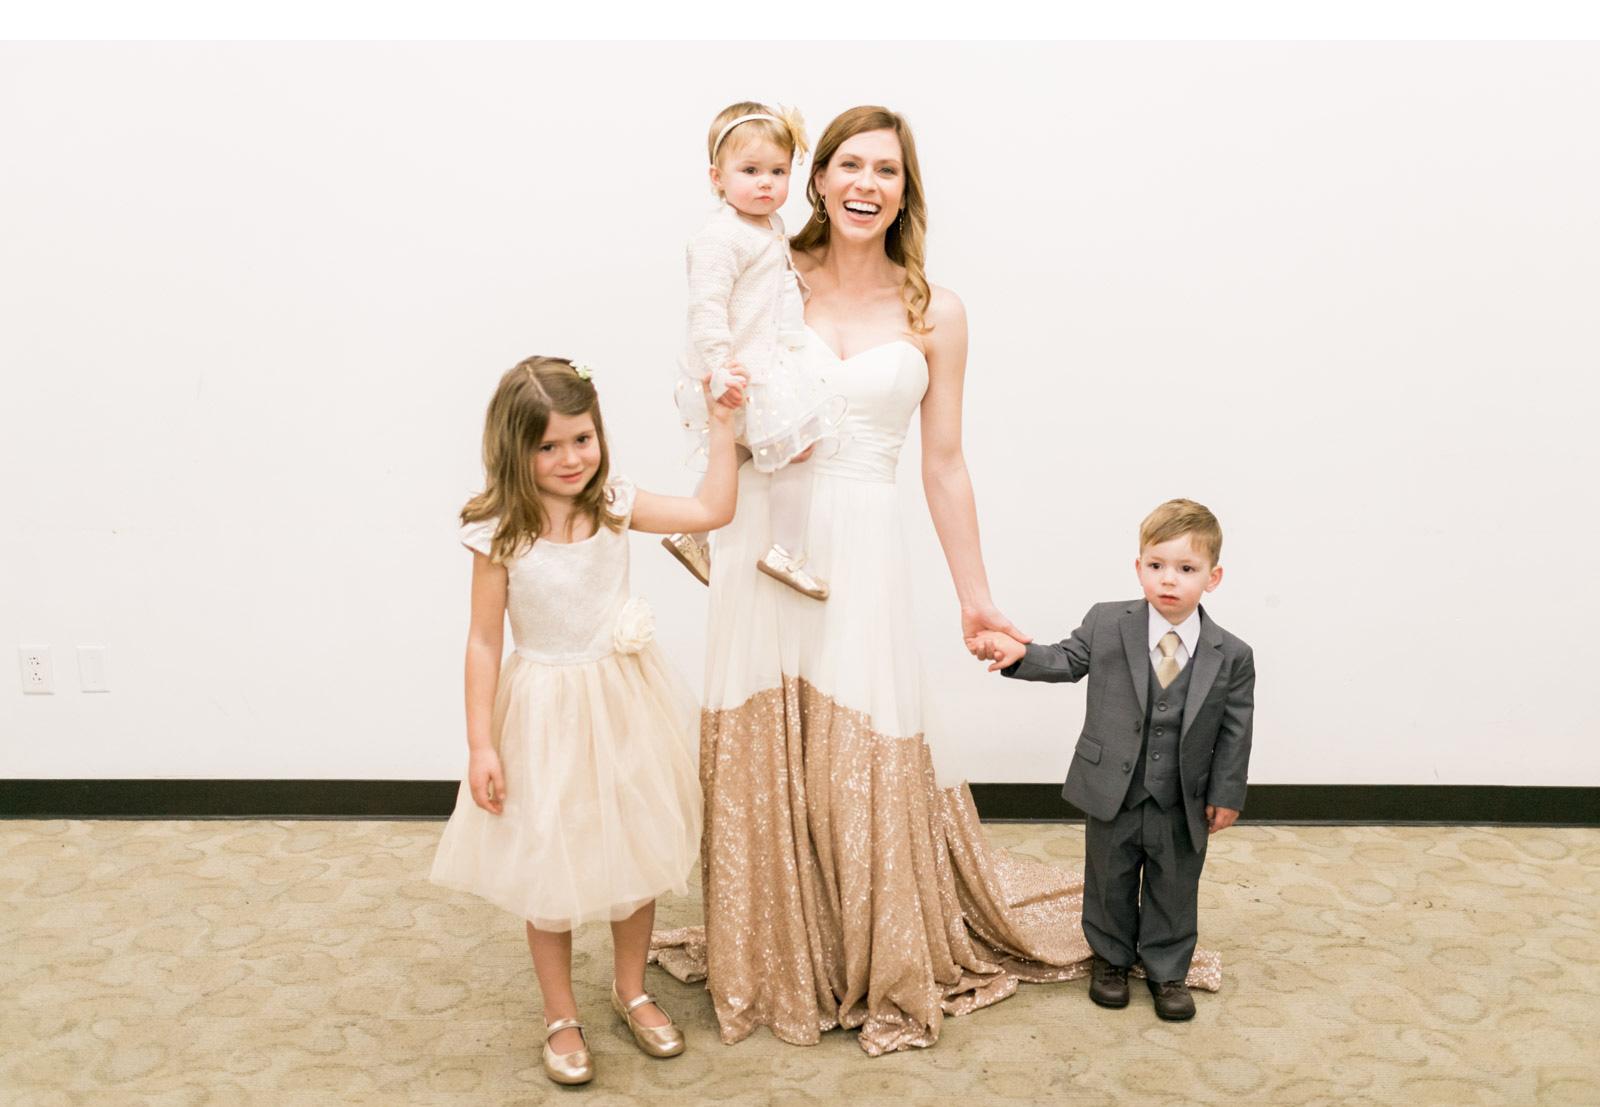 California-Wedding-Photographer-Natalie-Schutt-Photography_08.jpg